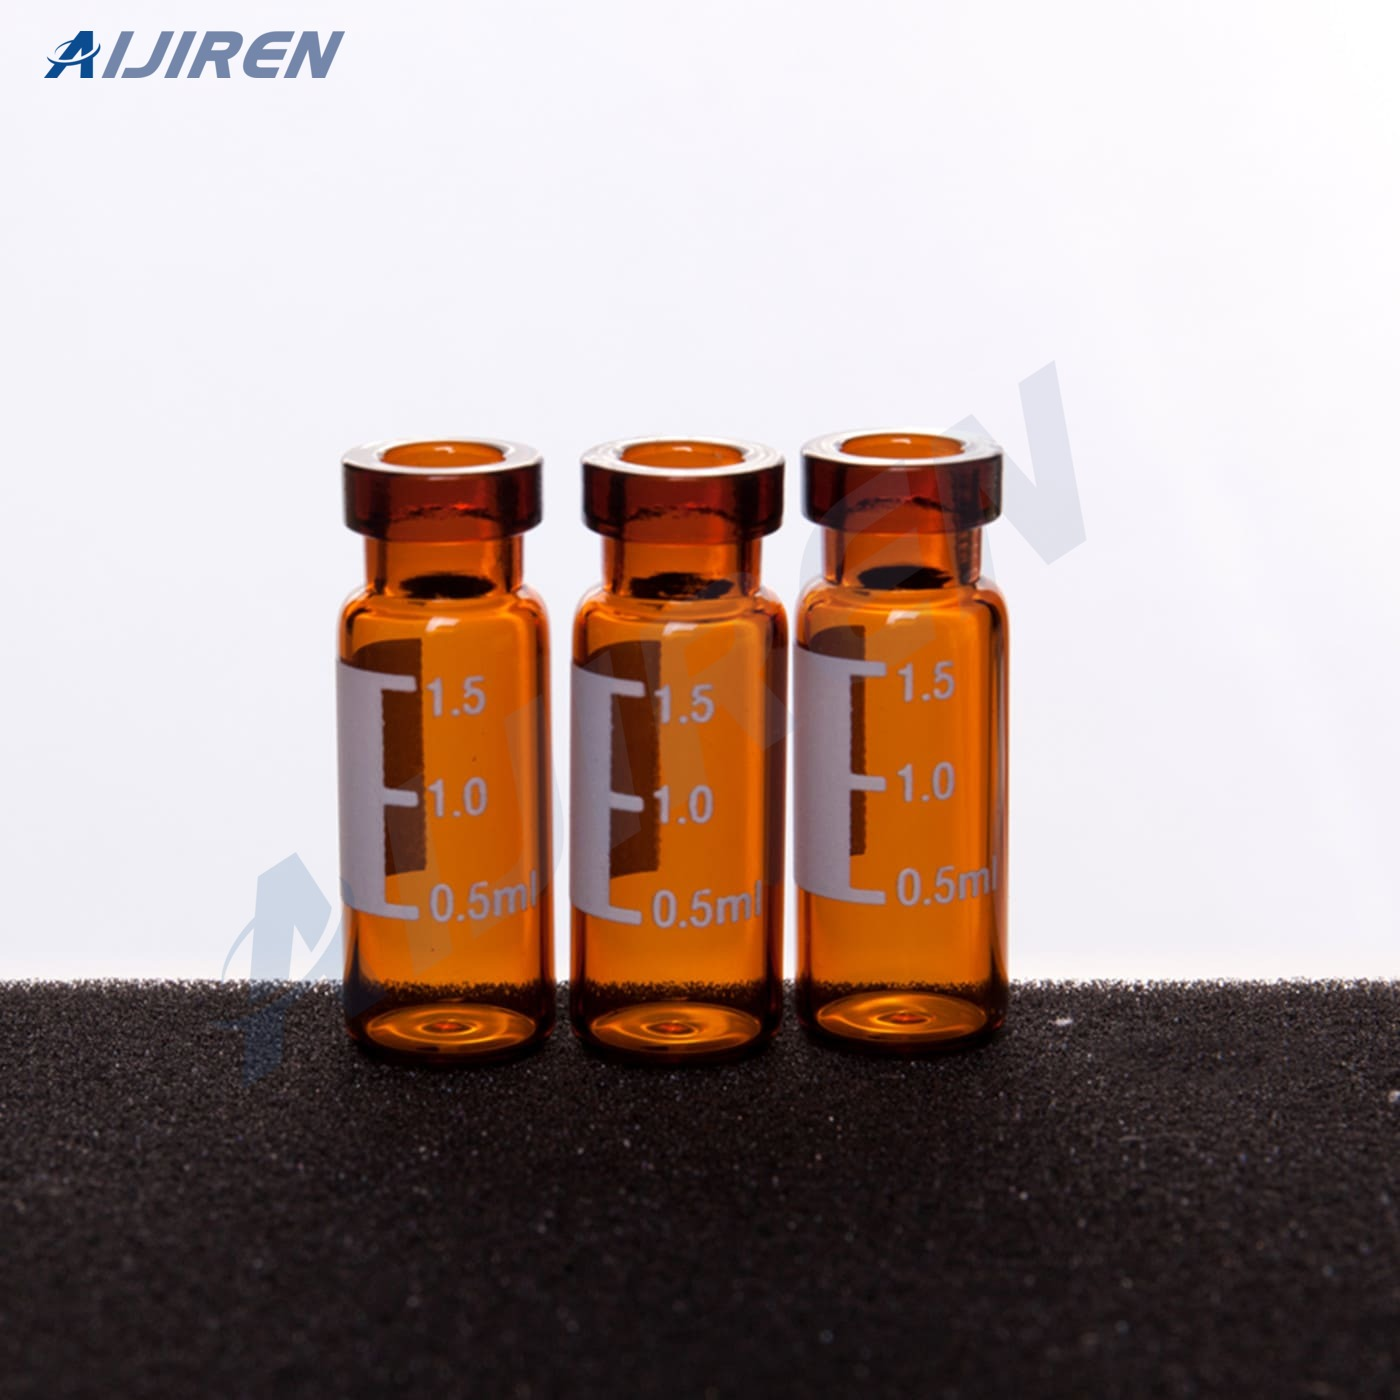 20ml headspace vial2ml 11mm Amber Glass Vial